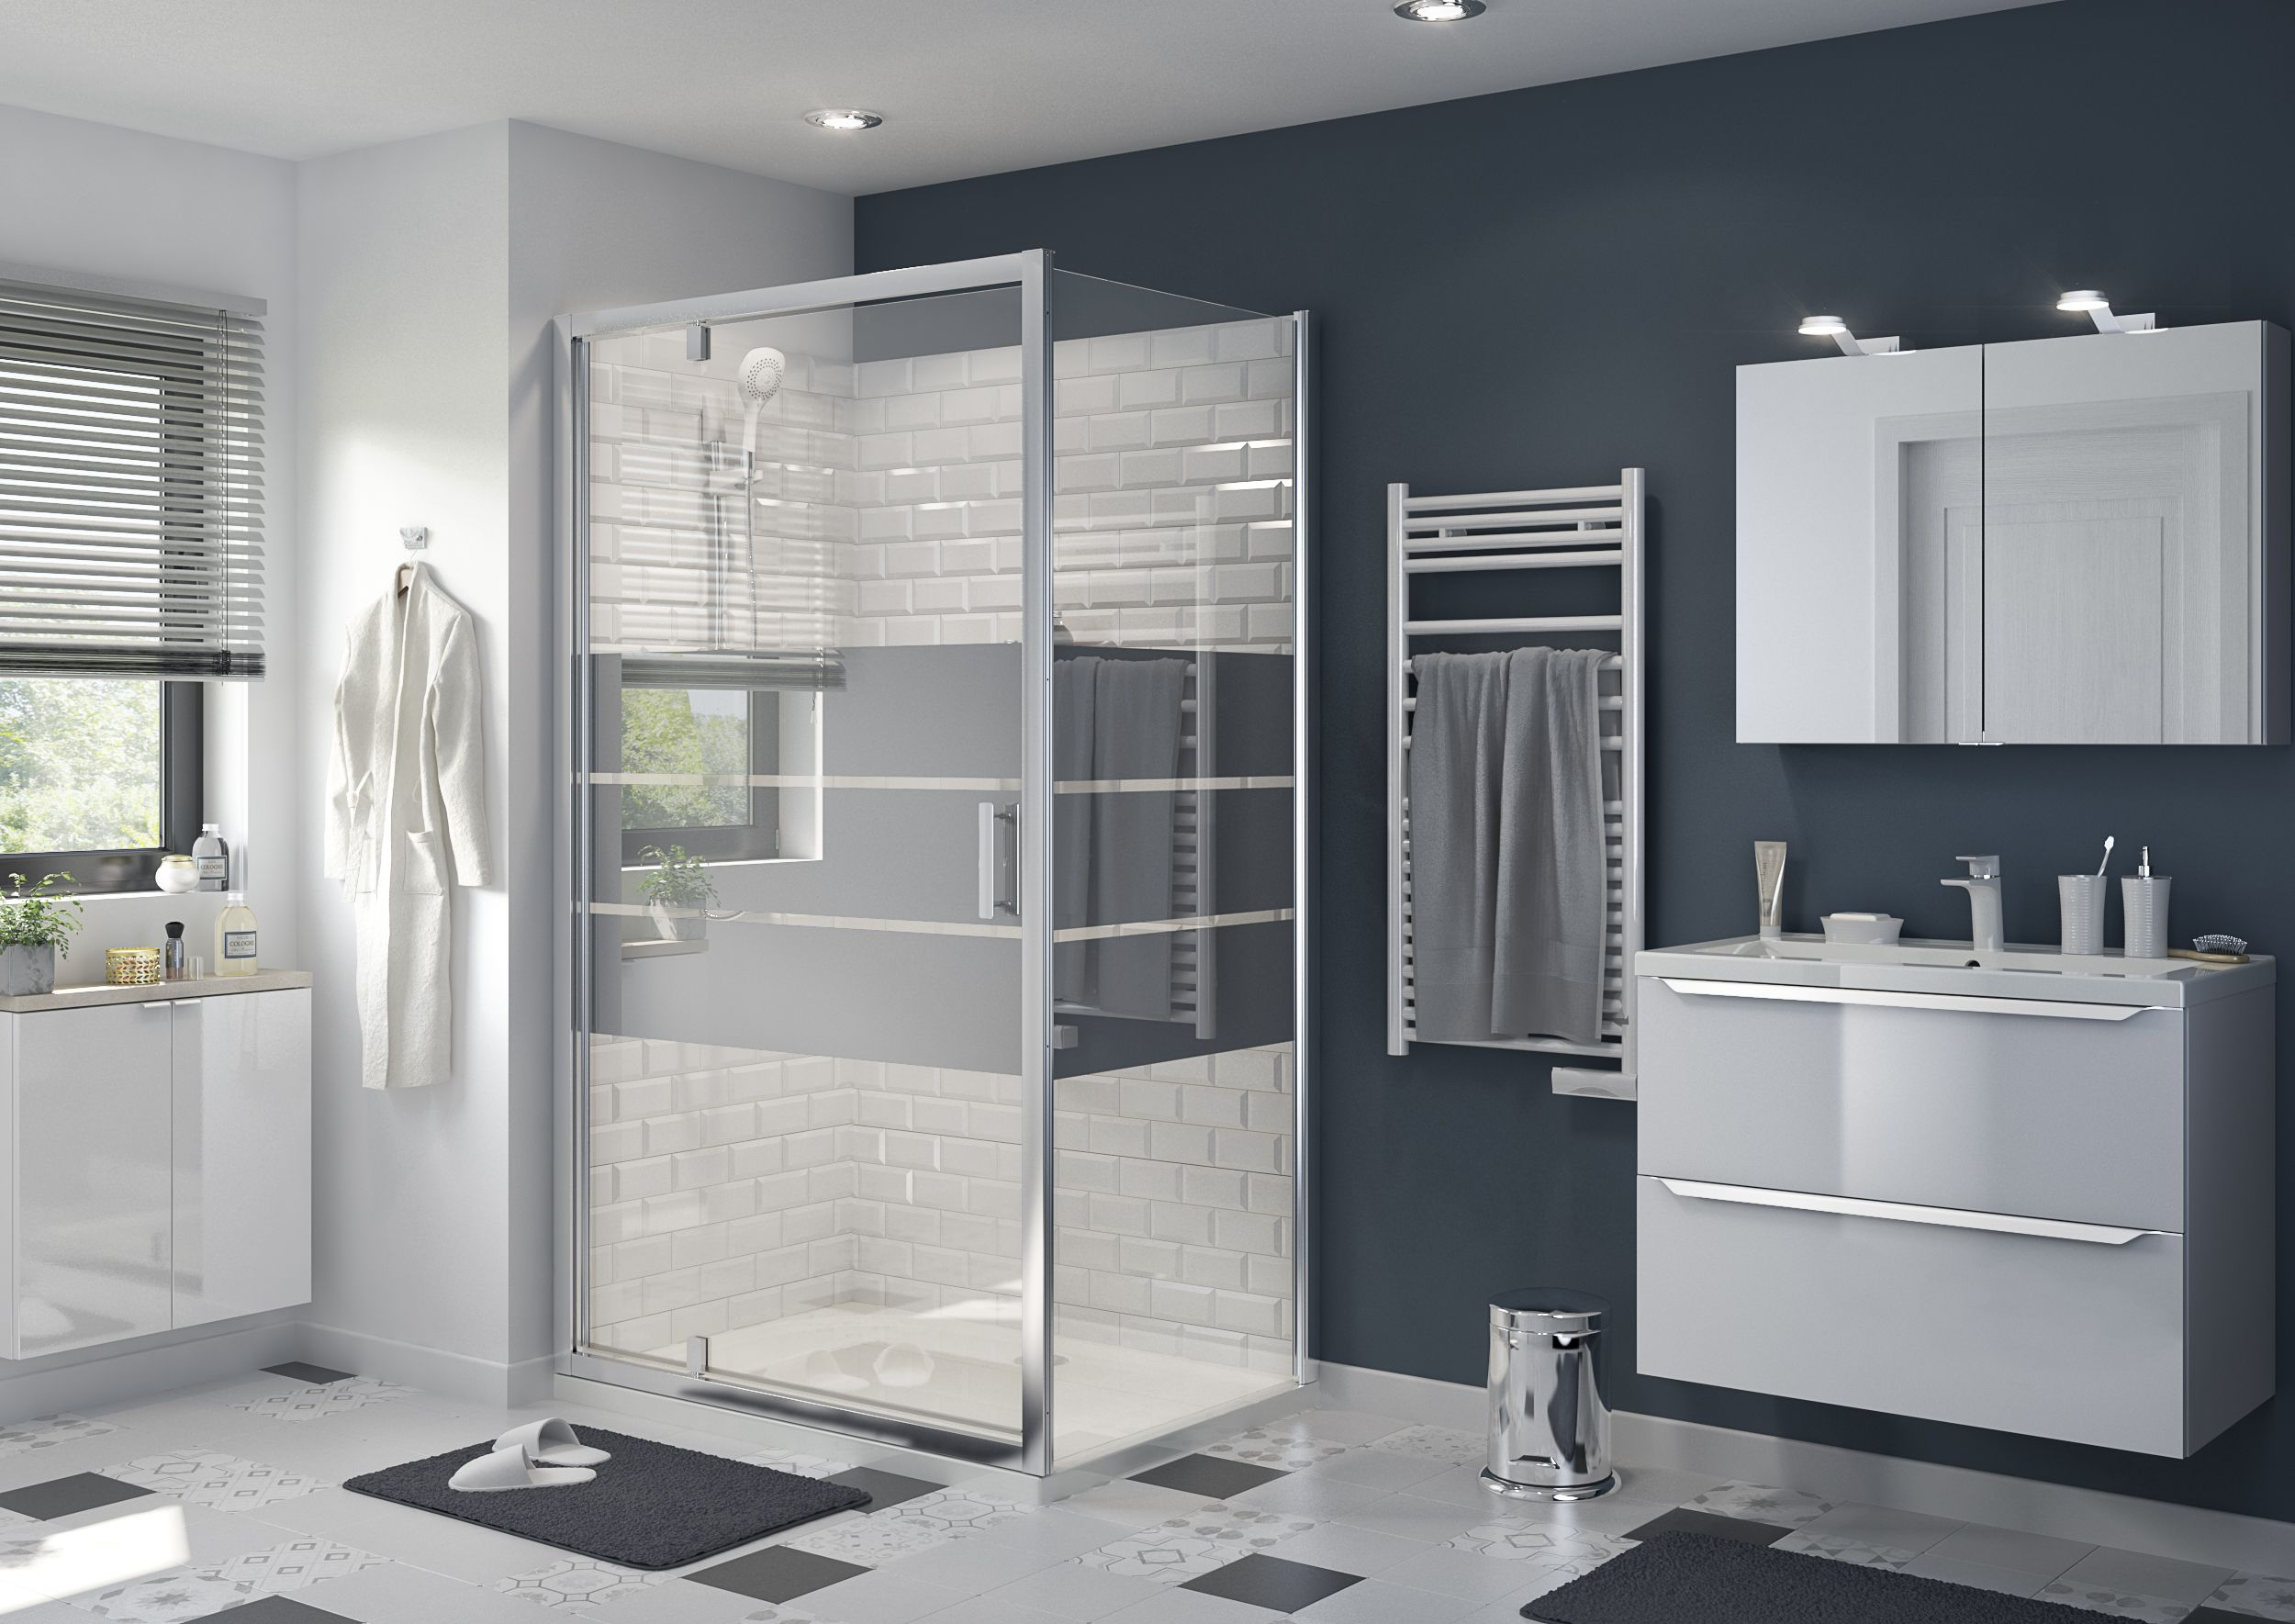 bathroom ranges imandra diy at b q rh diy com b&q bathroom tall cabinets b&q bathroom cabinets imandra